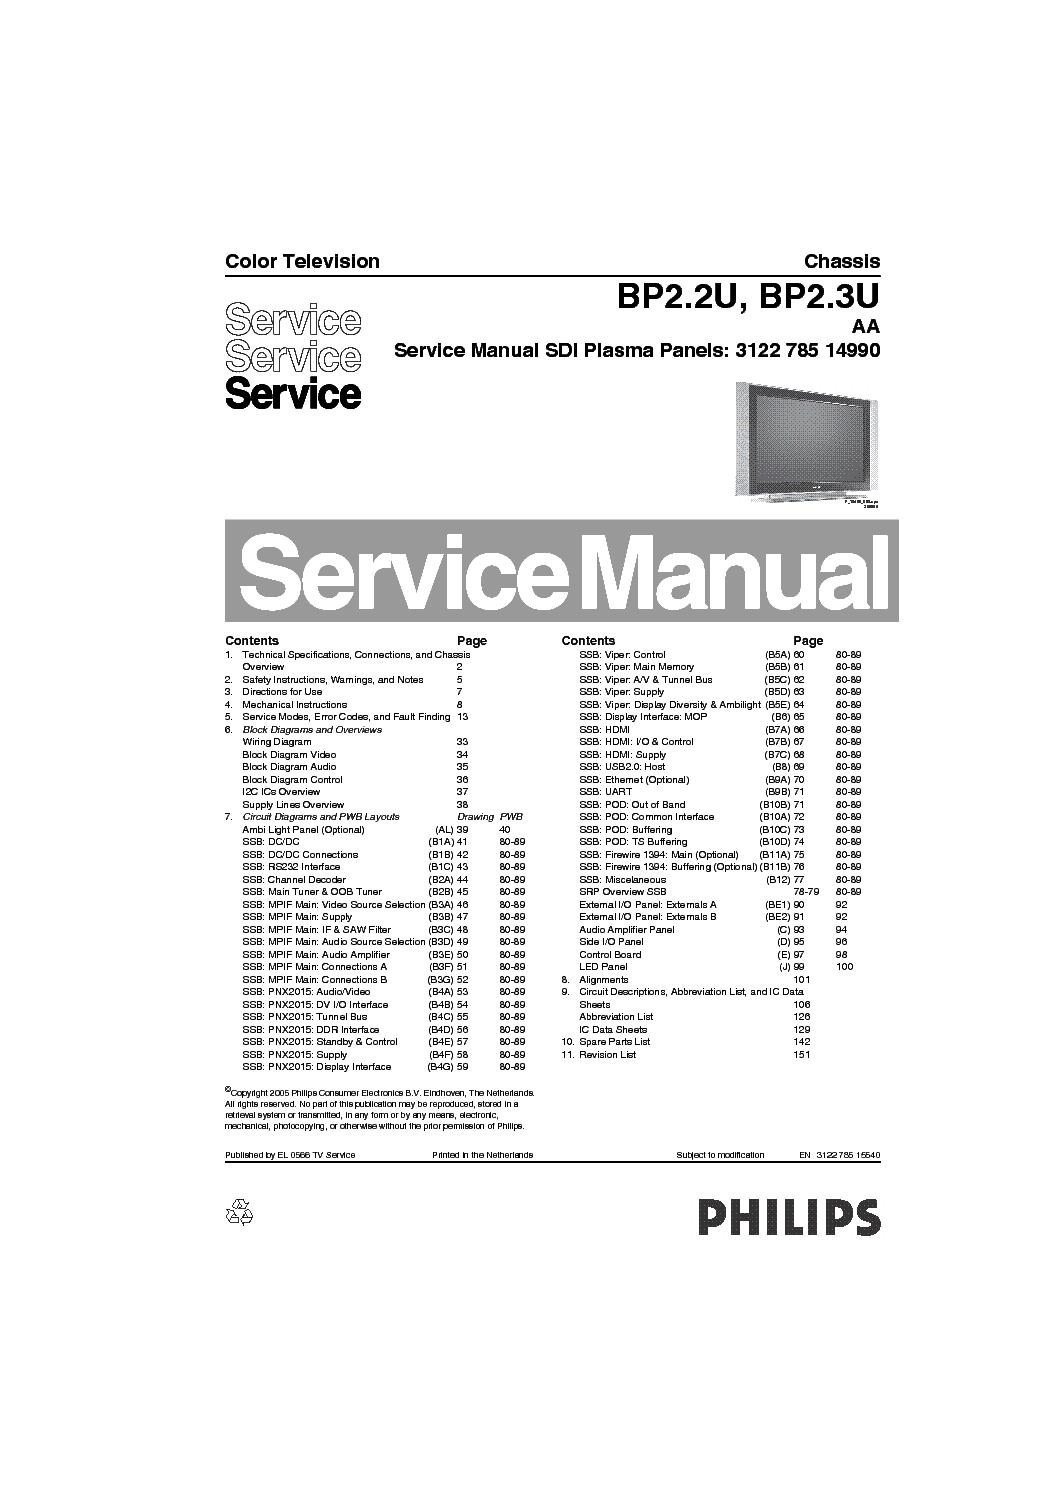 philips plasma tv repair manual user guide manual that easy to read u2022 rh sibere co philips plasma flat tv manual Philips Product Manuals